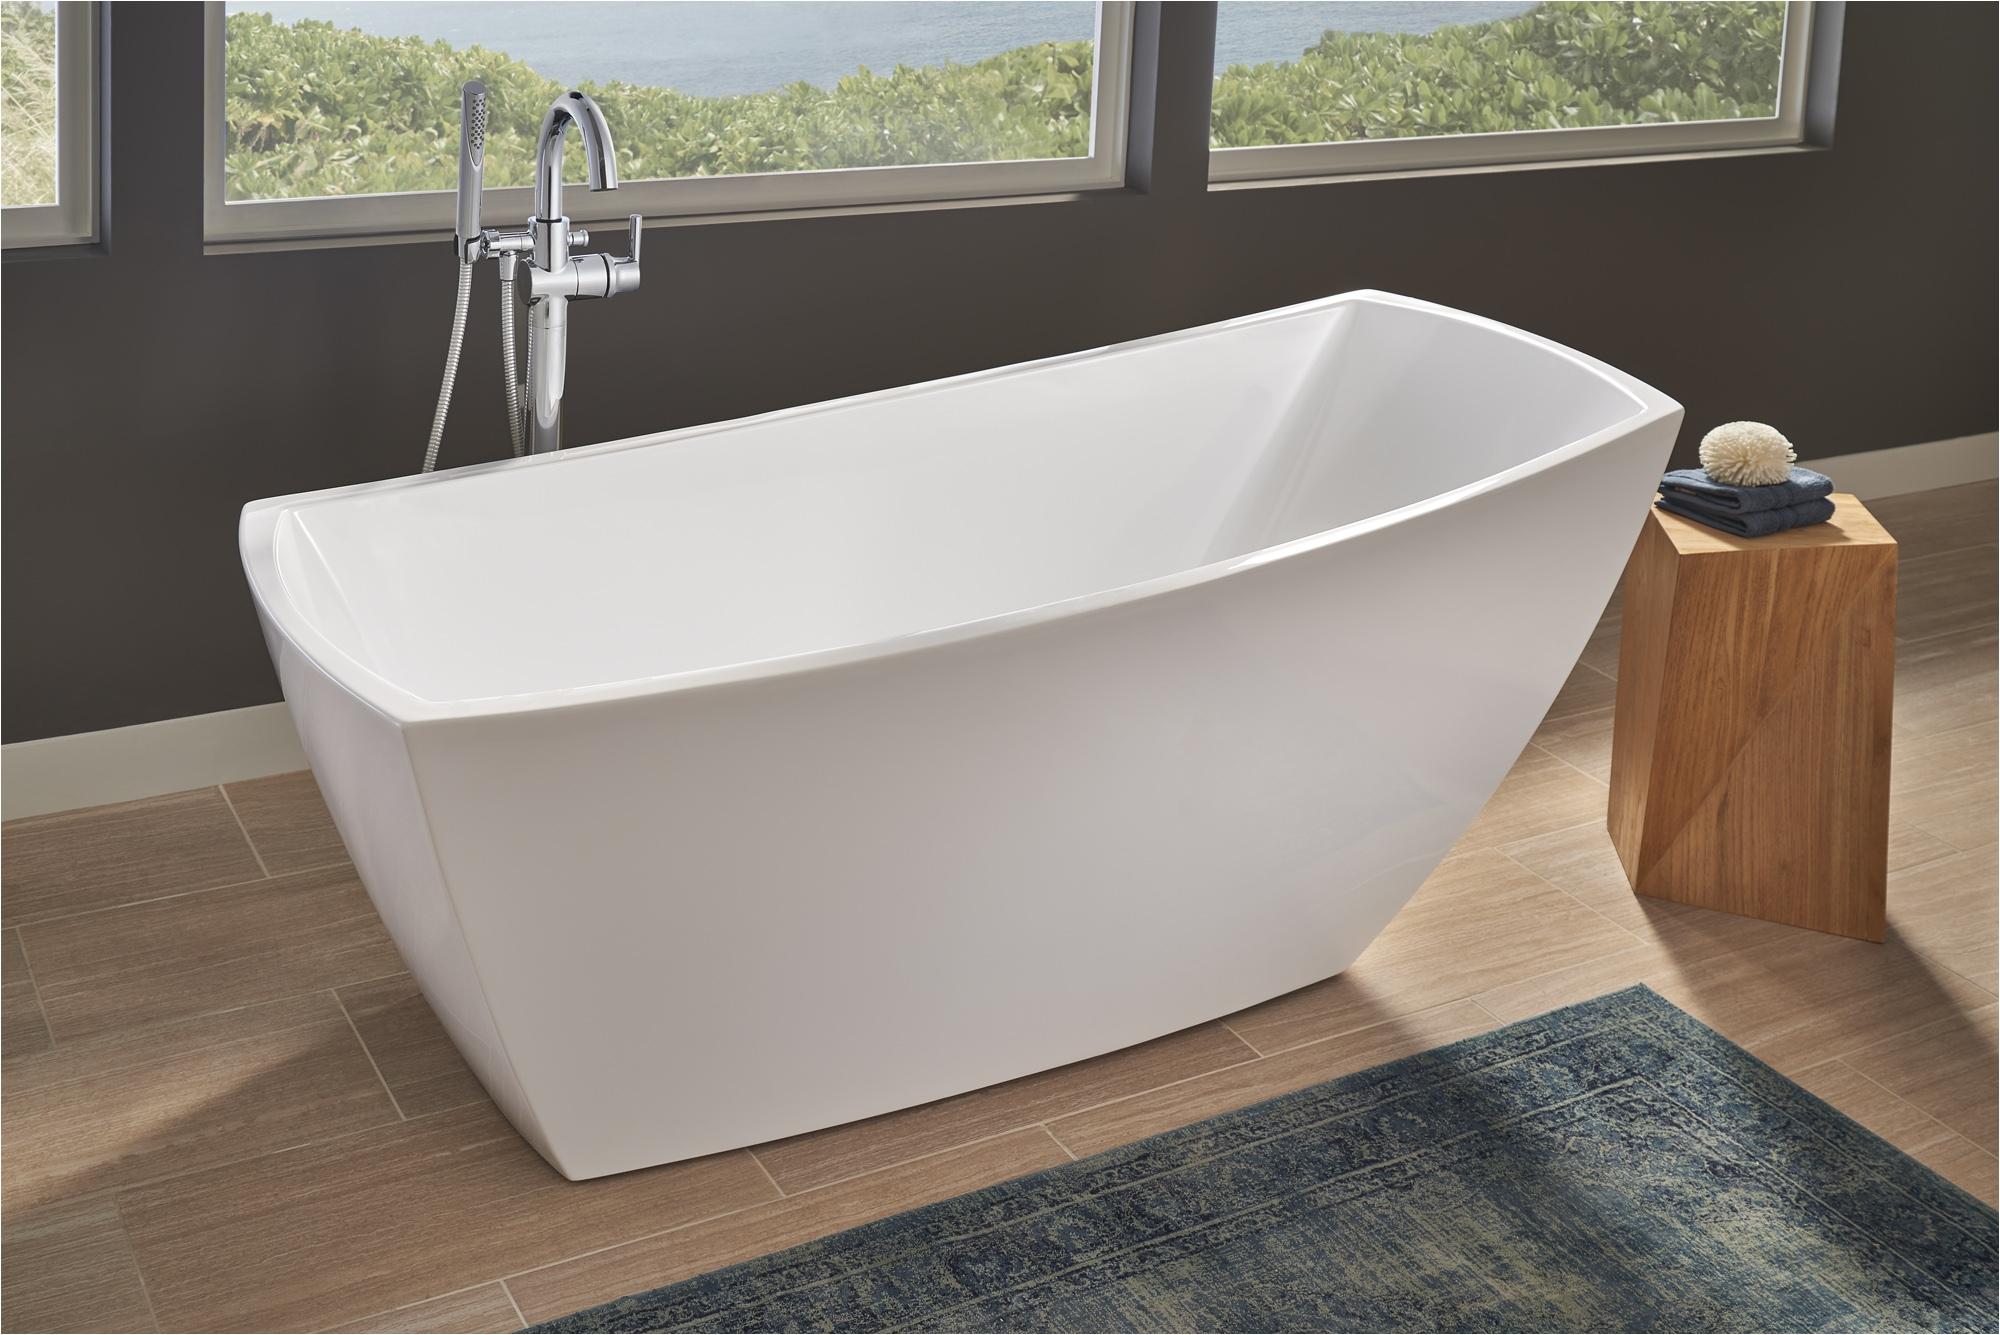 jacuzzi stella soaker tub makes a freestanding statement jlc online tubs bath jacuzzi